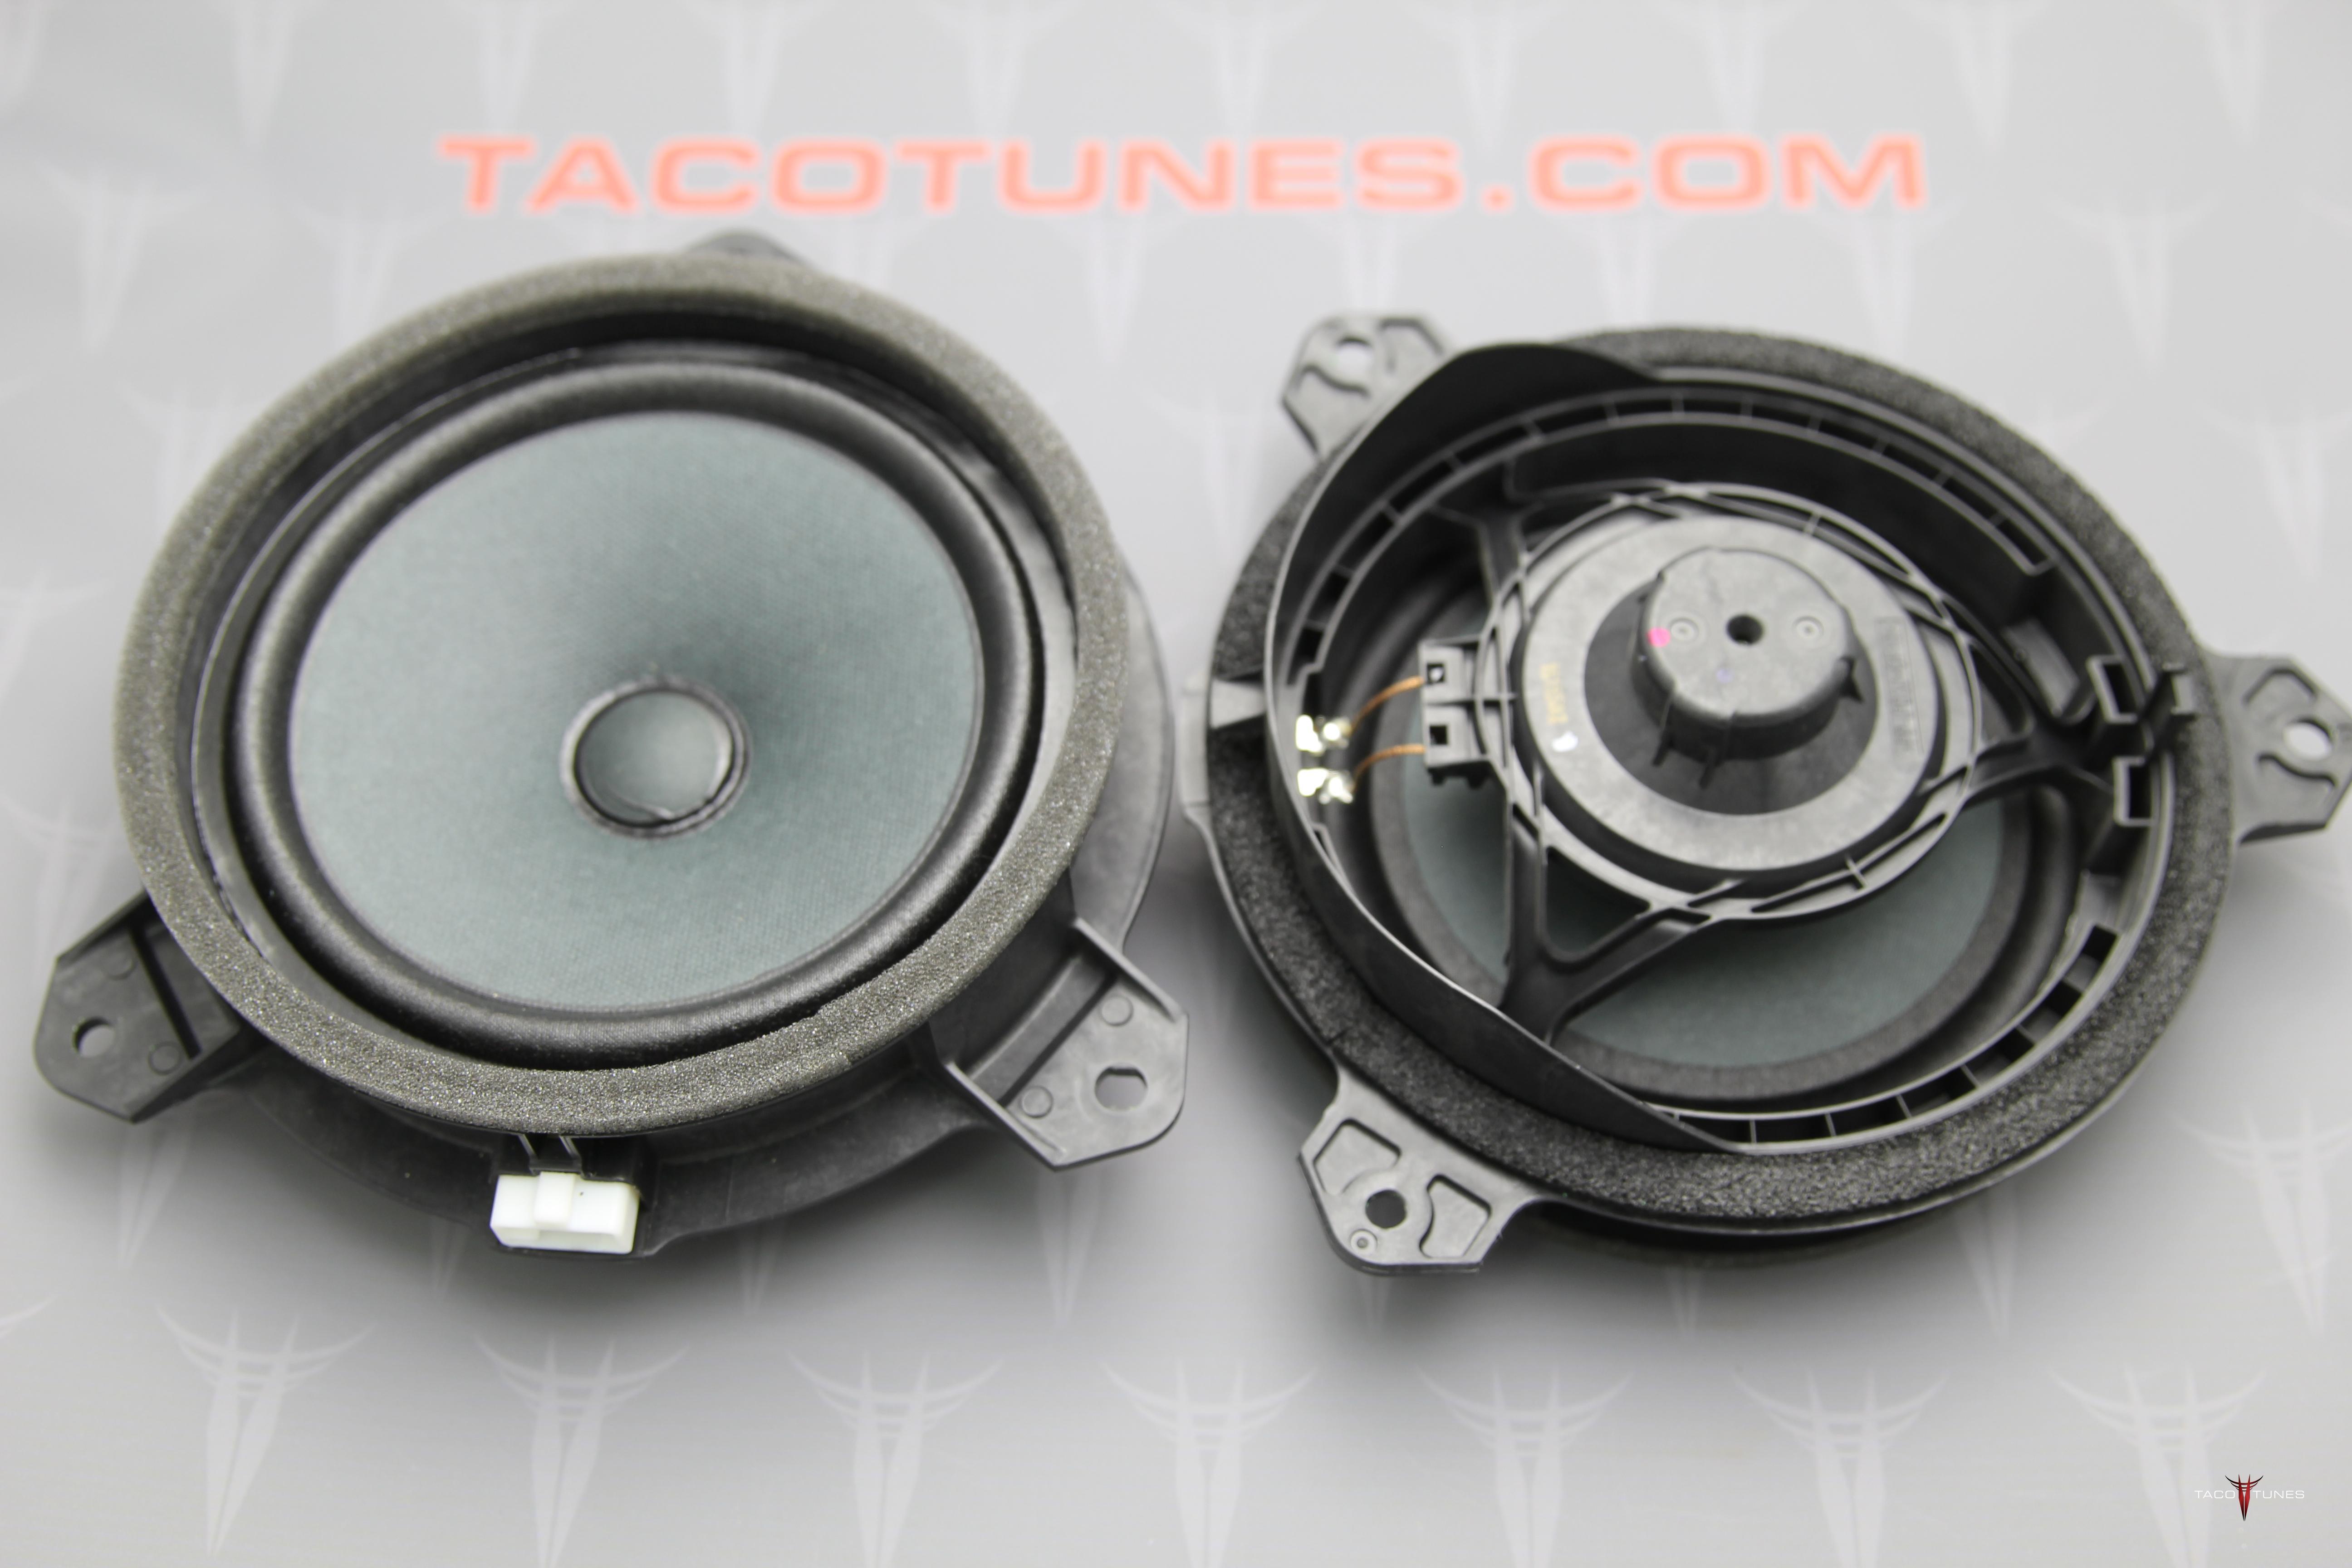 2005 2015 toyota tacoma rear door speakers taco tunes toyota audio solutions. Black Bedroom Furniture Sets. Home Design Ideas